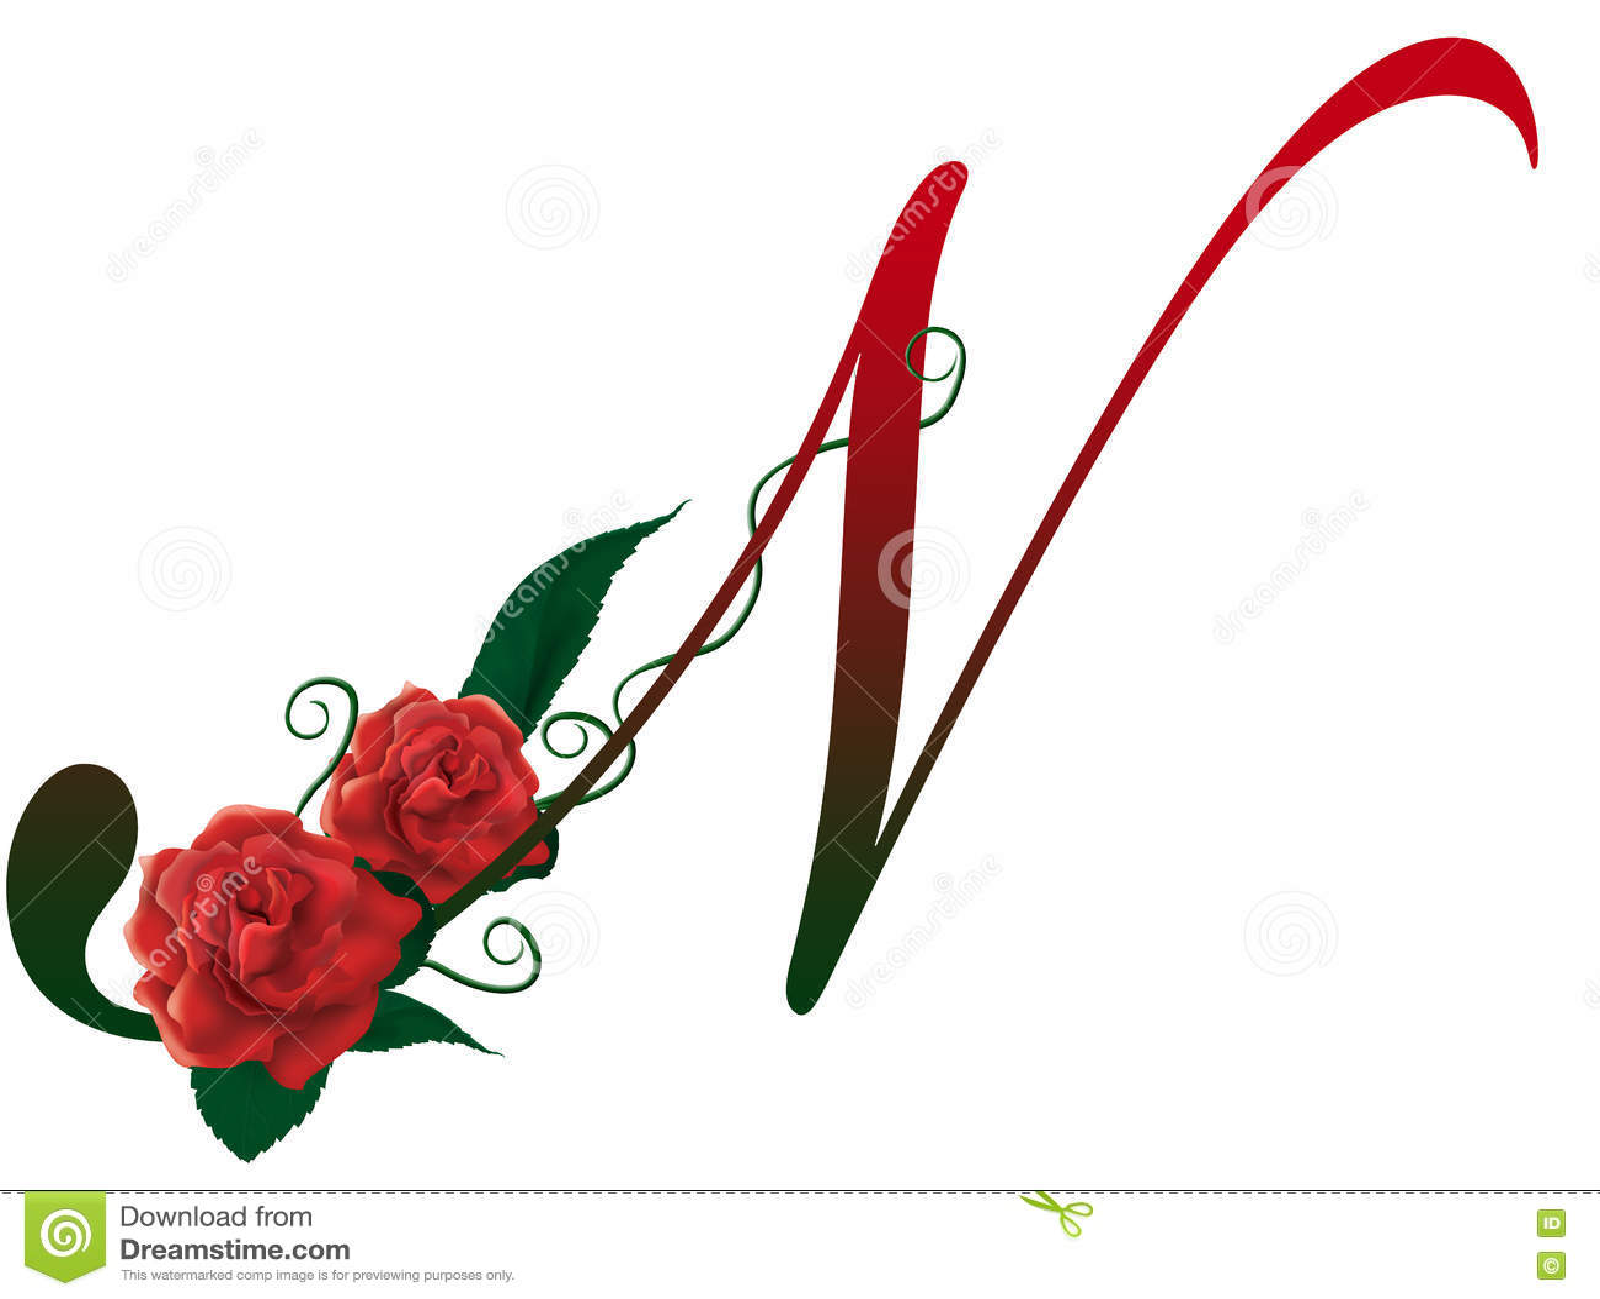 Letter N Floral Illustration Stock Photo - Illustration of floral, flowery: 78766222